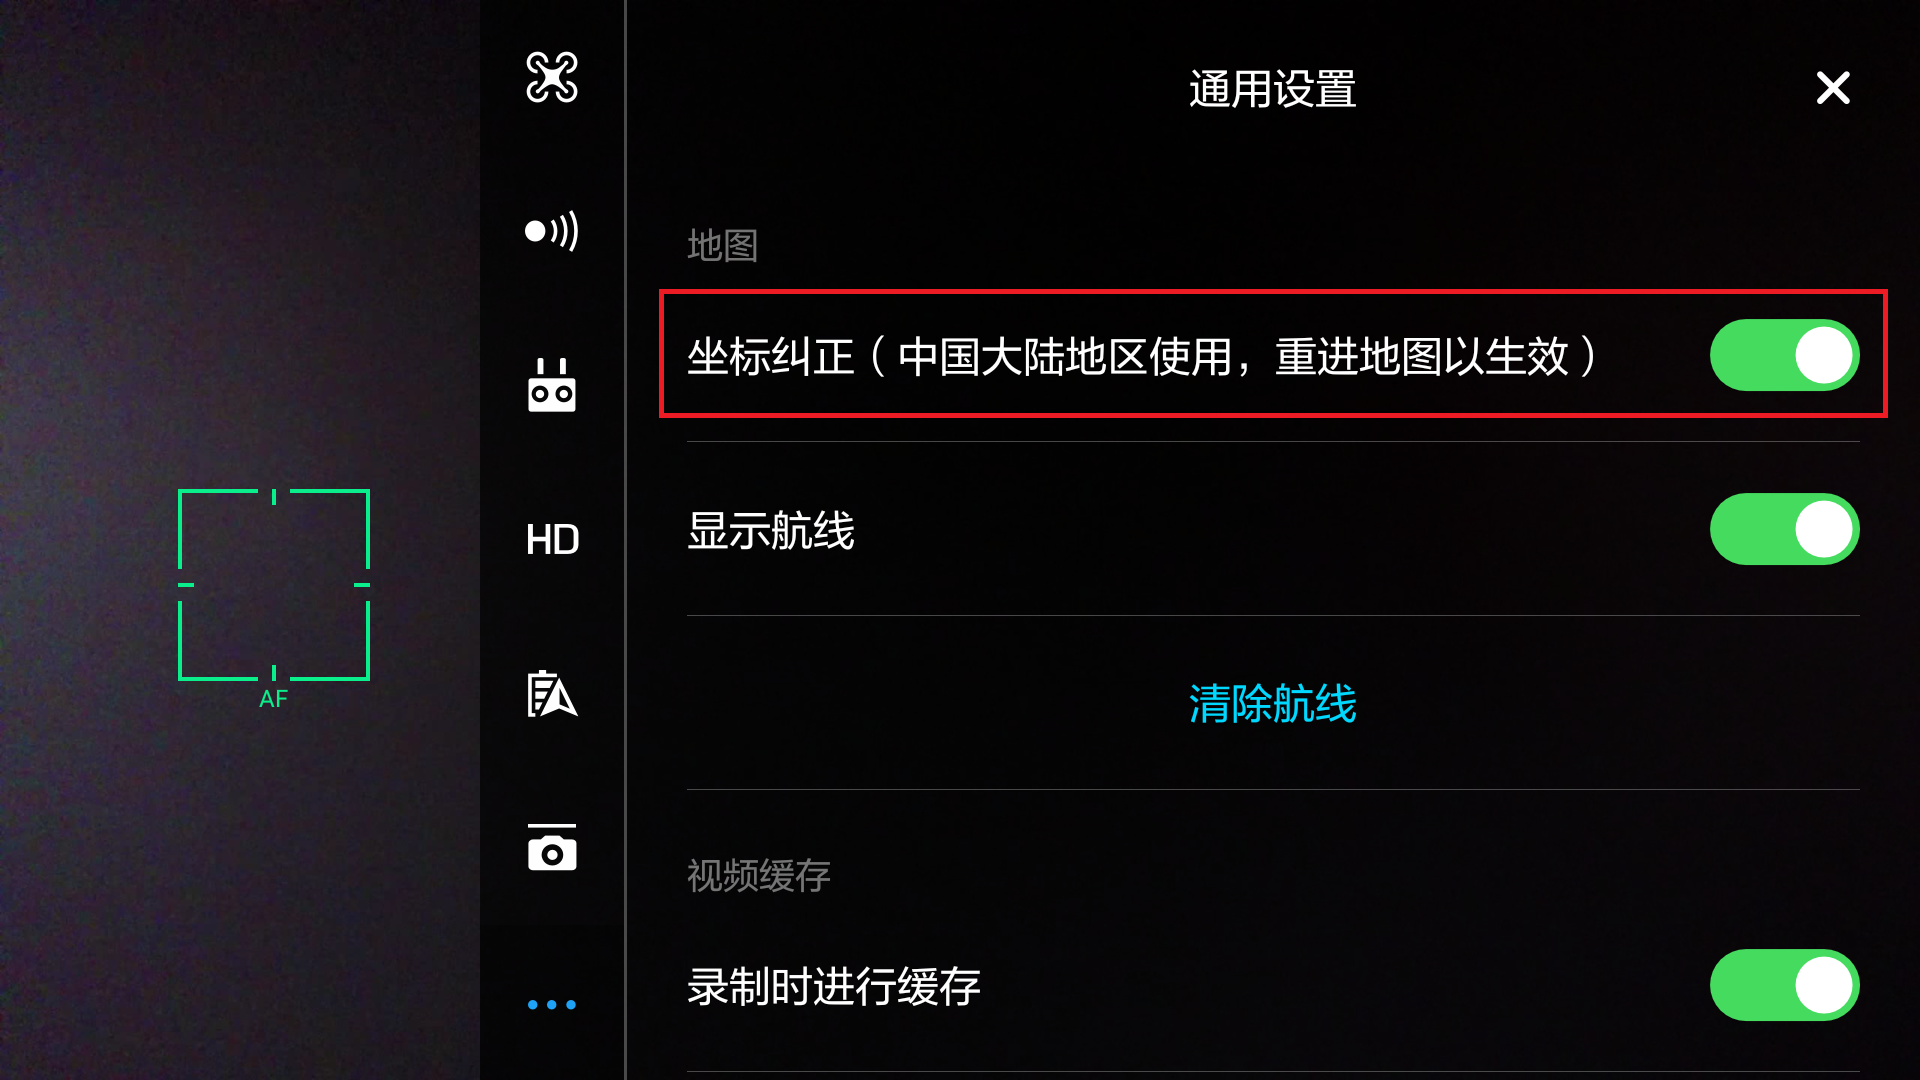 Screenshot_2017-01-24-10-49-04.png